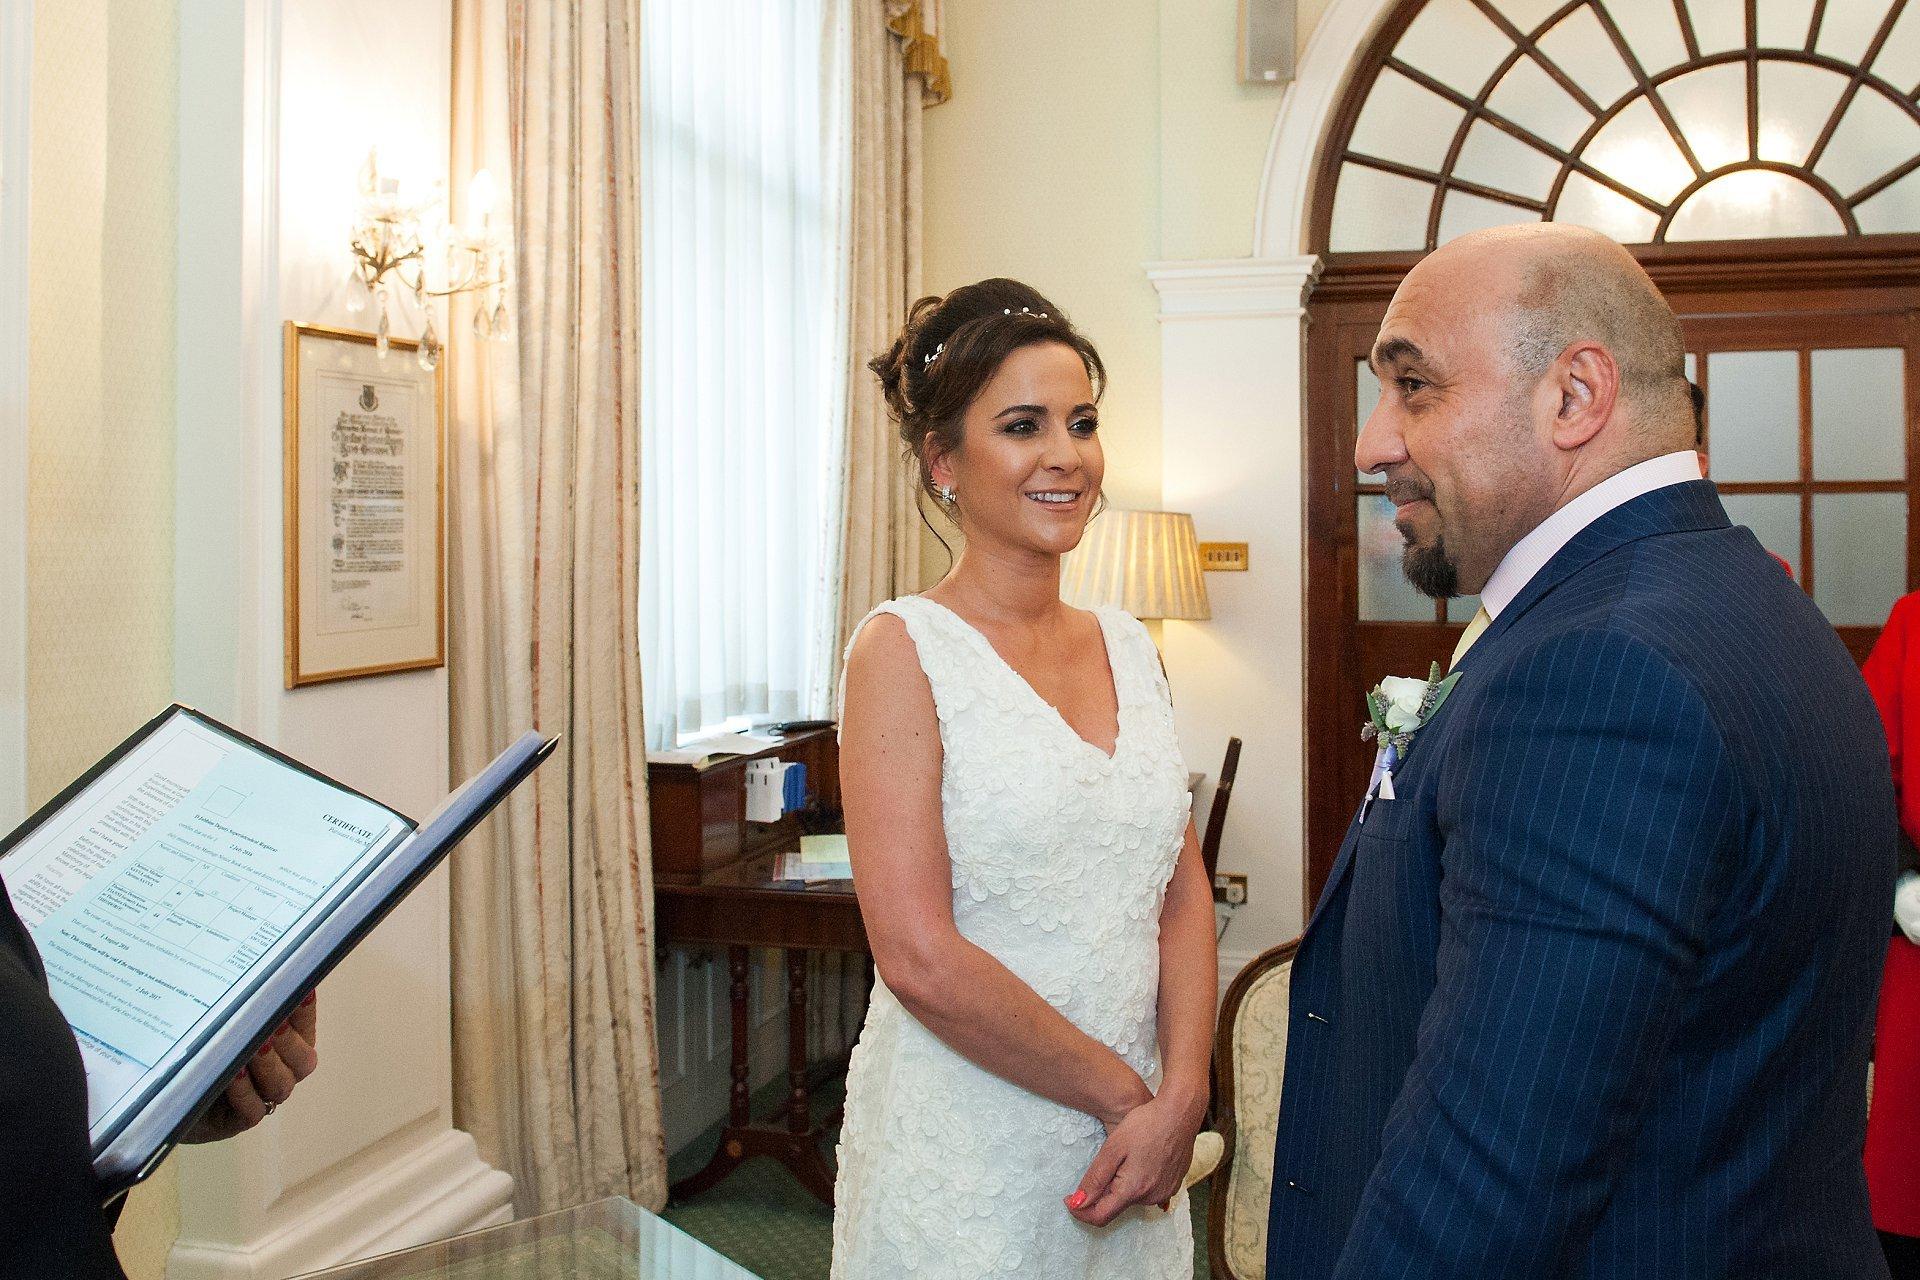 Bride Groom Enchanging Vows During Kensington Chelsea Register Office Civil Wedding